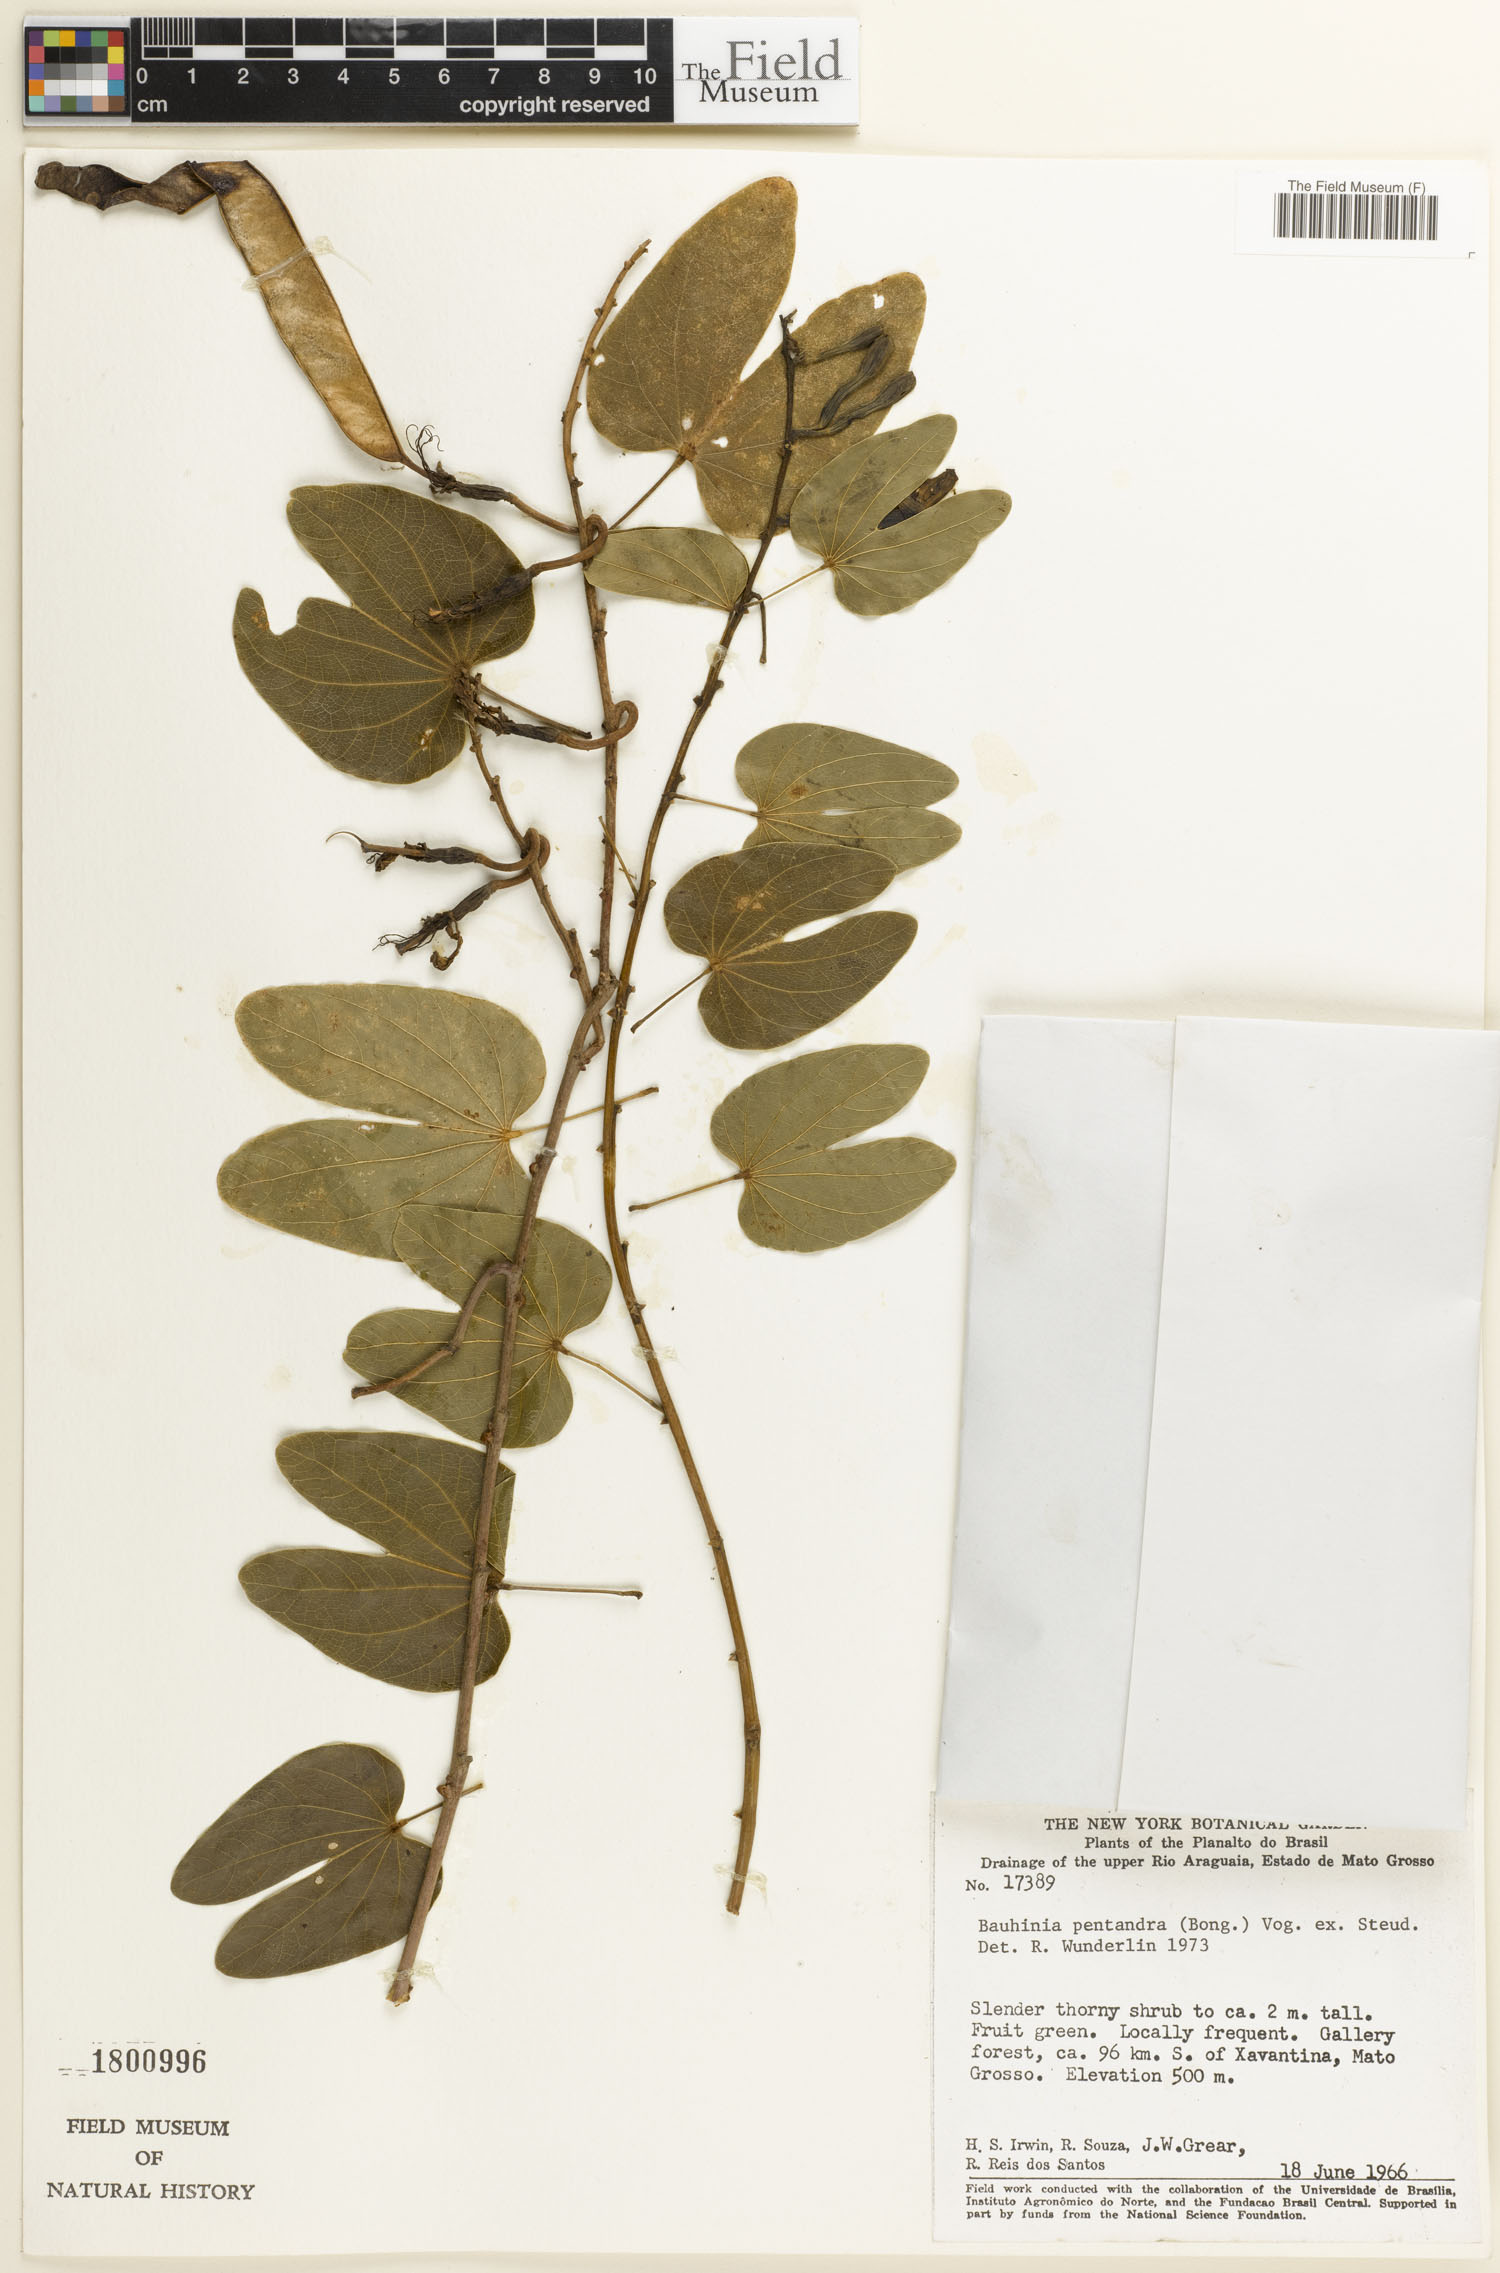 Bauhinia pentandra image